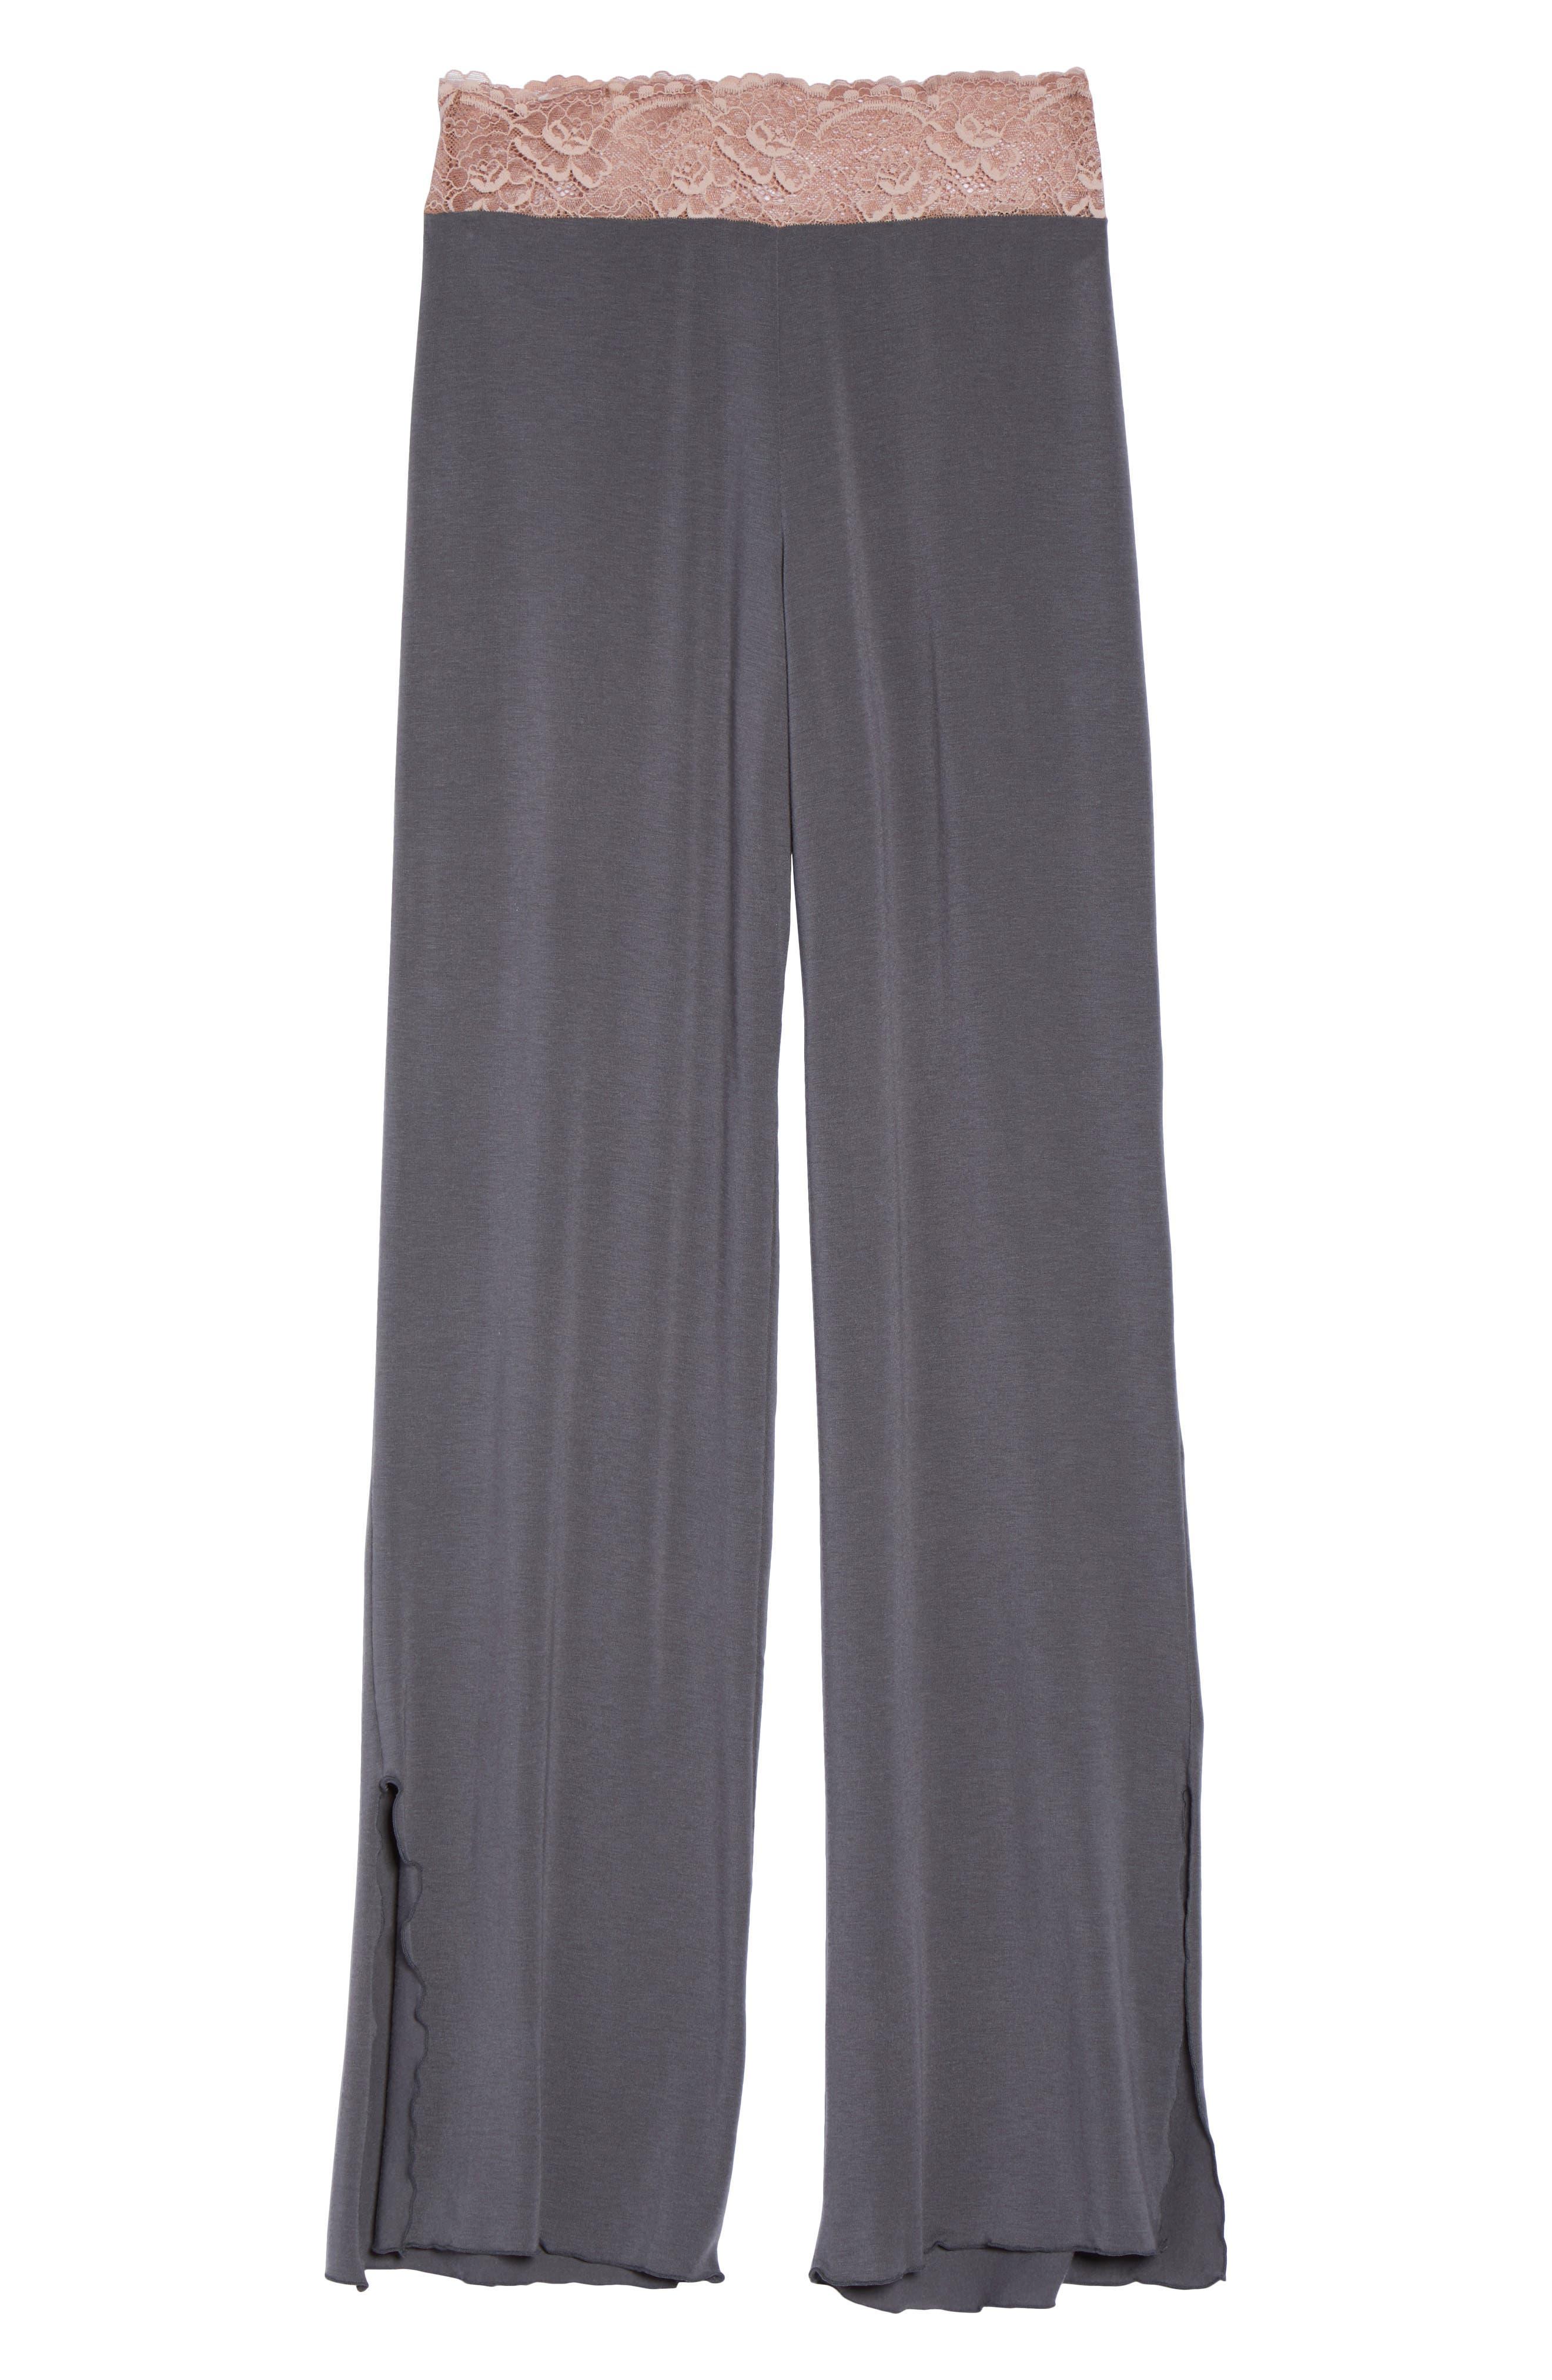 Lace Trim Pants,                             Alternate thumbnail 6, color,                             SLATE WITH JAVA LACE